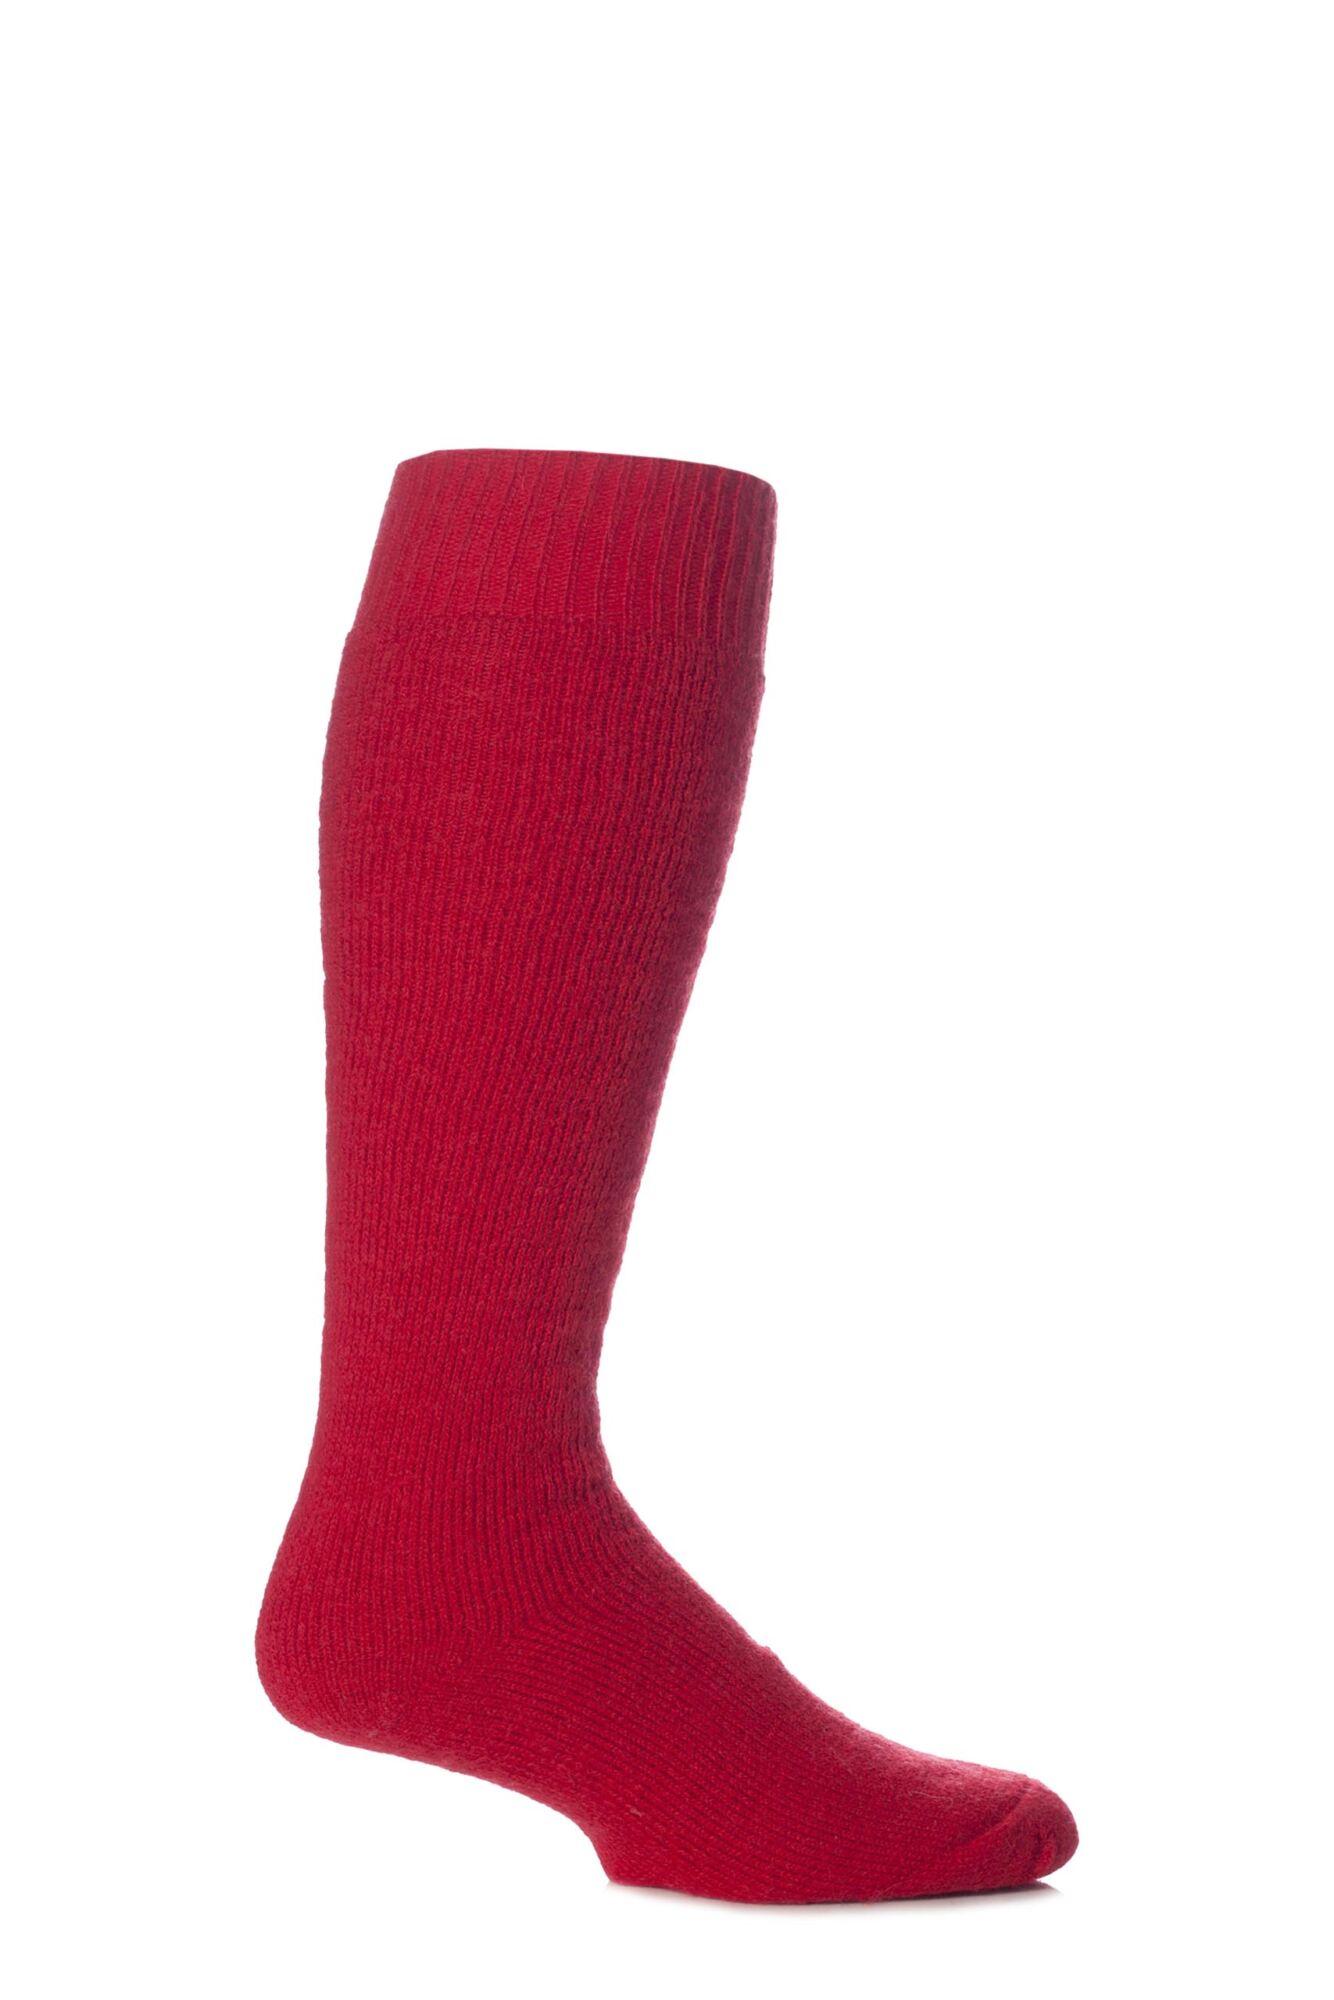 1 Pair of London Mohair Knee High Socks With Cushioning Unisex - SOCKSHOP of London